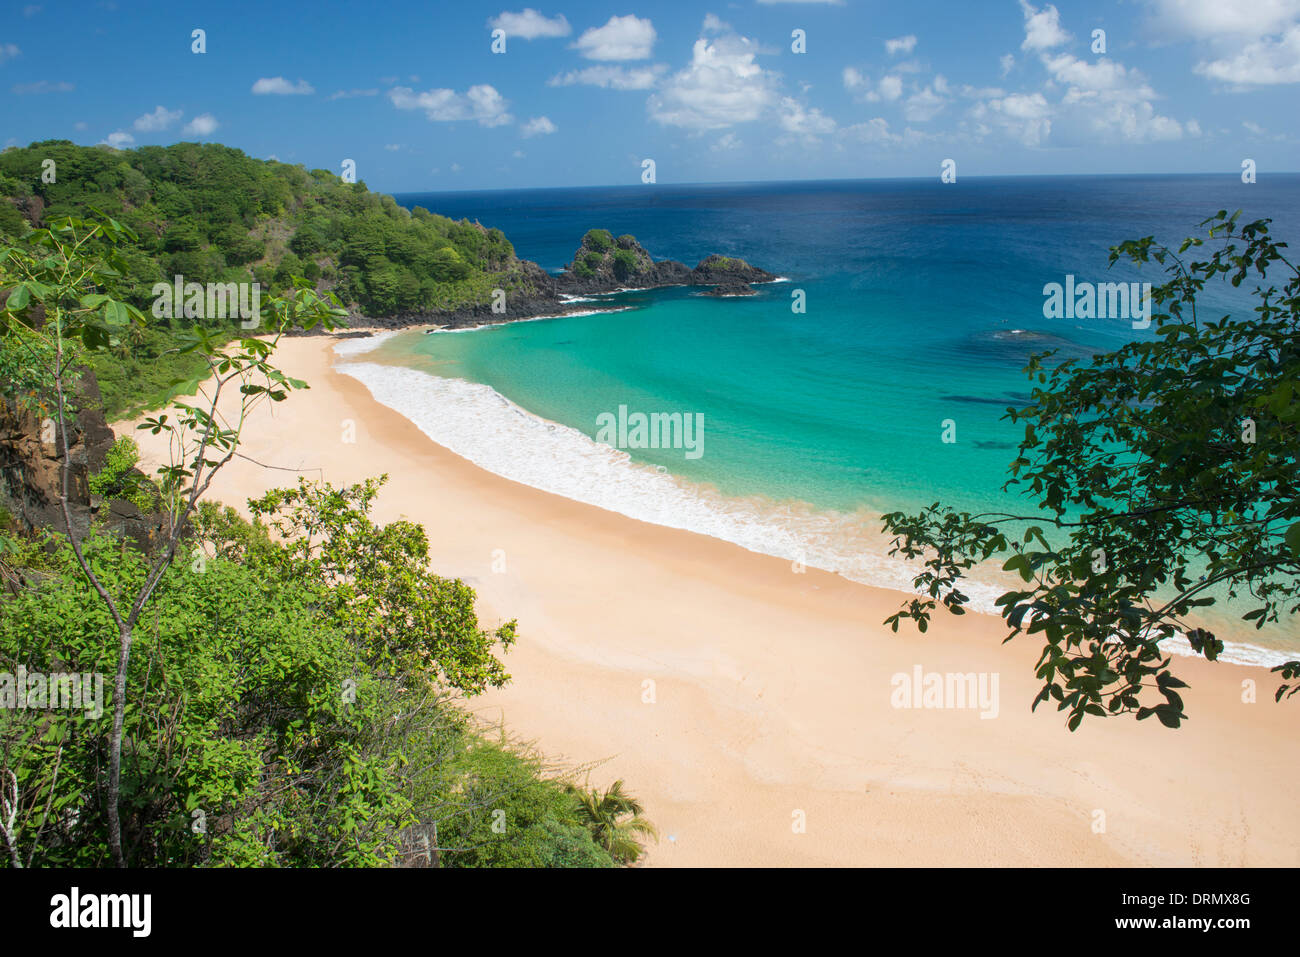 Sancho Beach Fernando De Noronha National Marine Park Brasilien Brasiliens beste Strand Atlantik zum UNESCO-Weltkulturerbe Stockbild